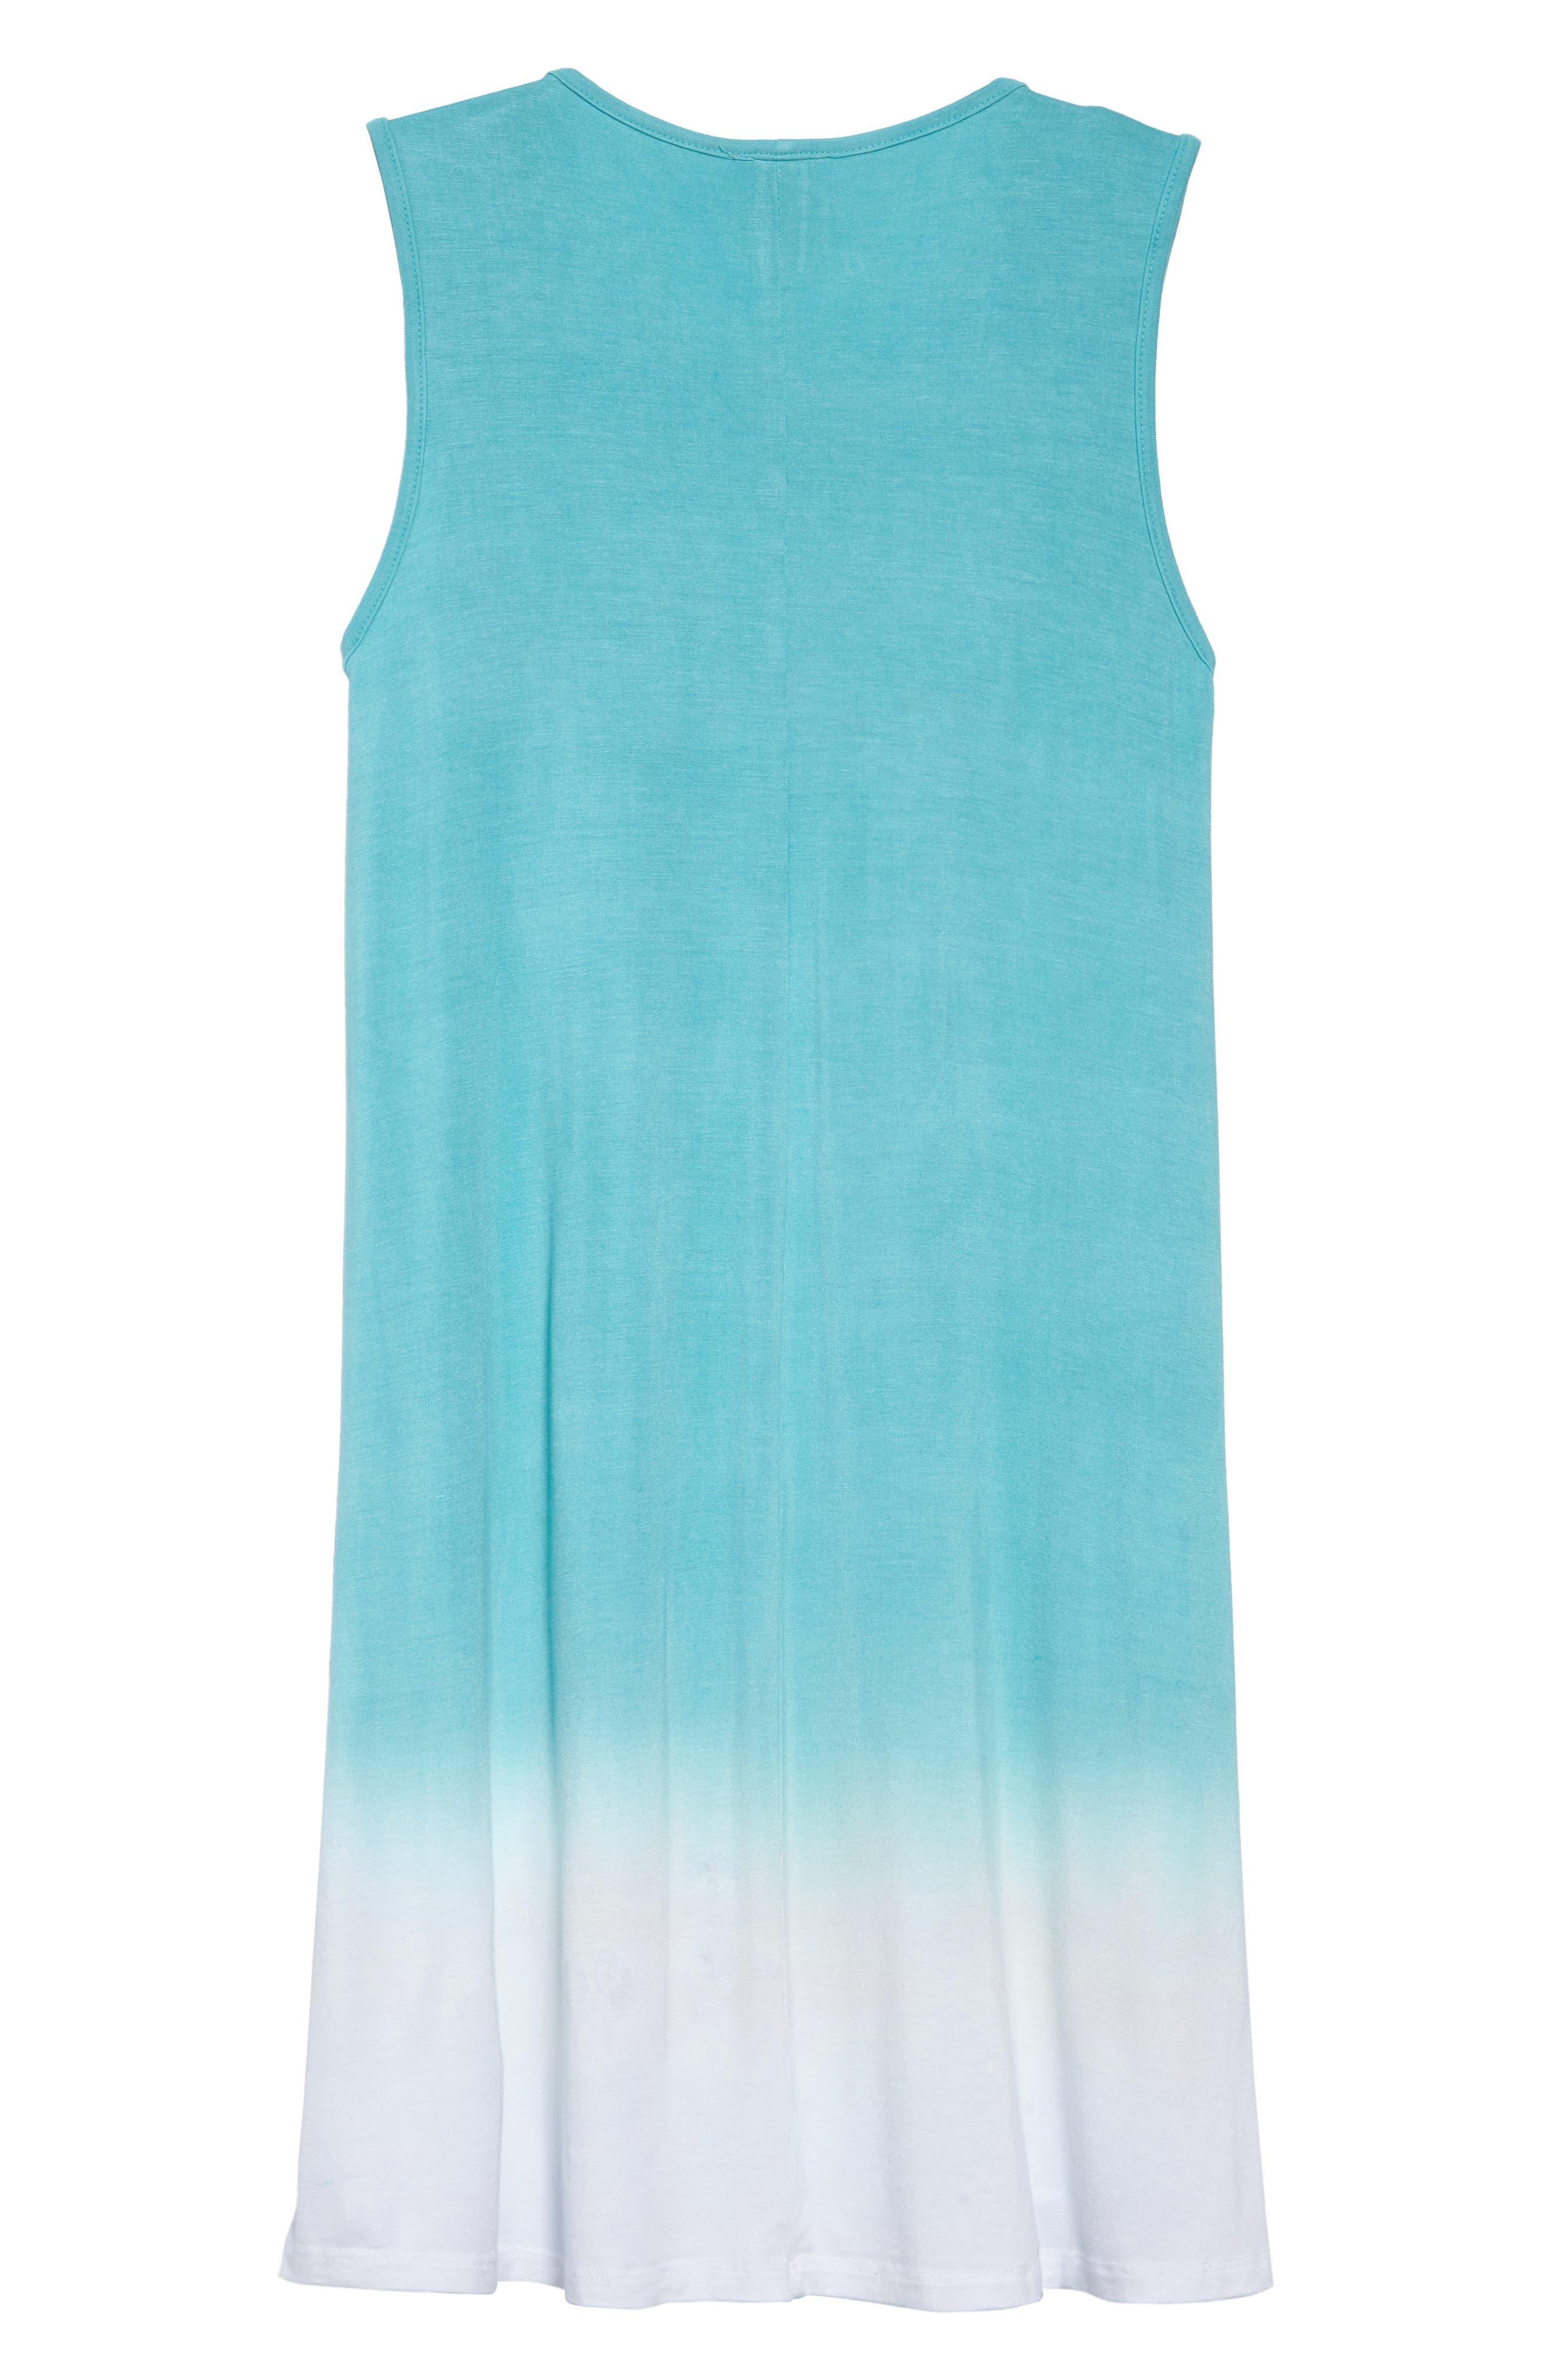 Grenadine Ombré T-Shirt Dress,                             Alternate thumbnail 2, color,